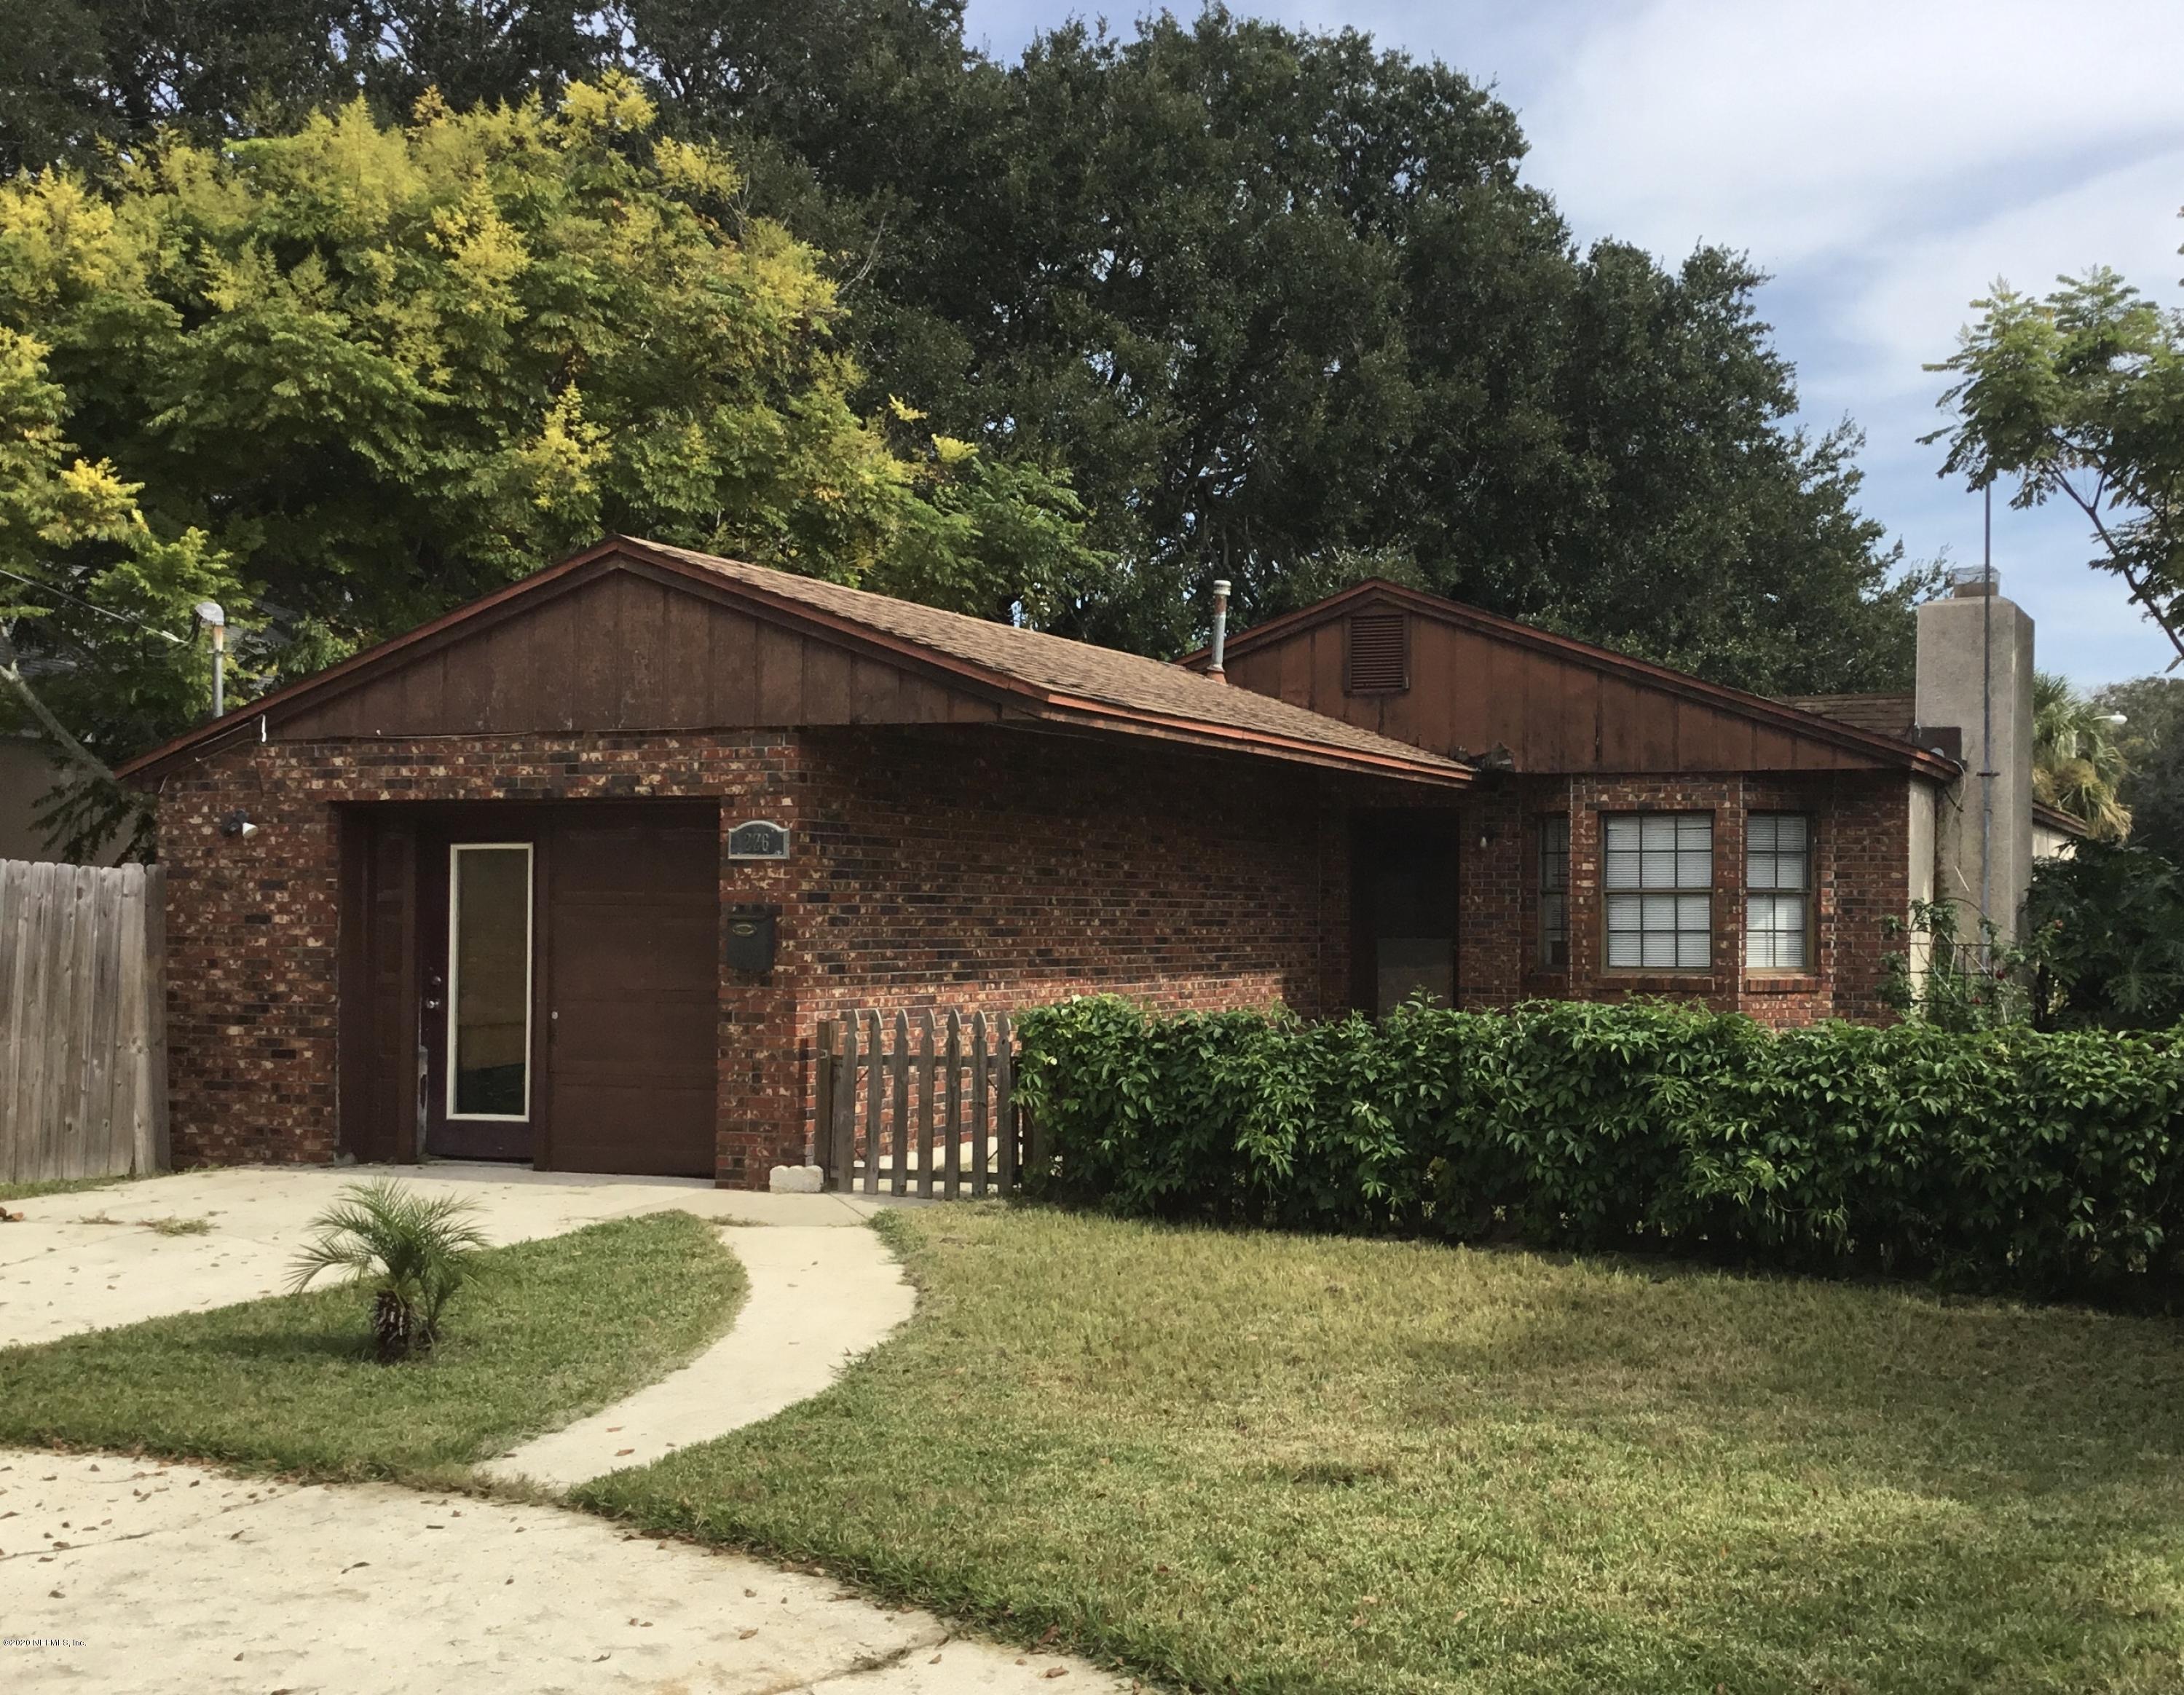 226 HERADA, ST AUGUSTINE, FLORIDA 32080, 3 Bedrooms Bedrooms, ,1 BathroomBathrooms,Residential,For sale,HERADA,1083413